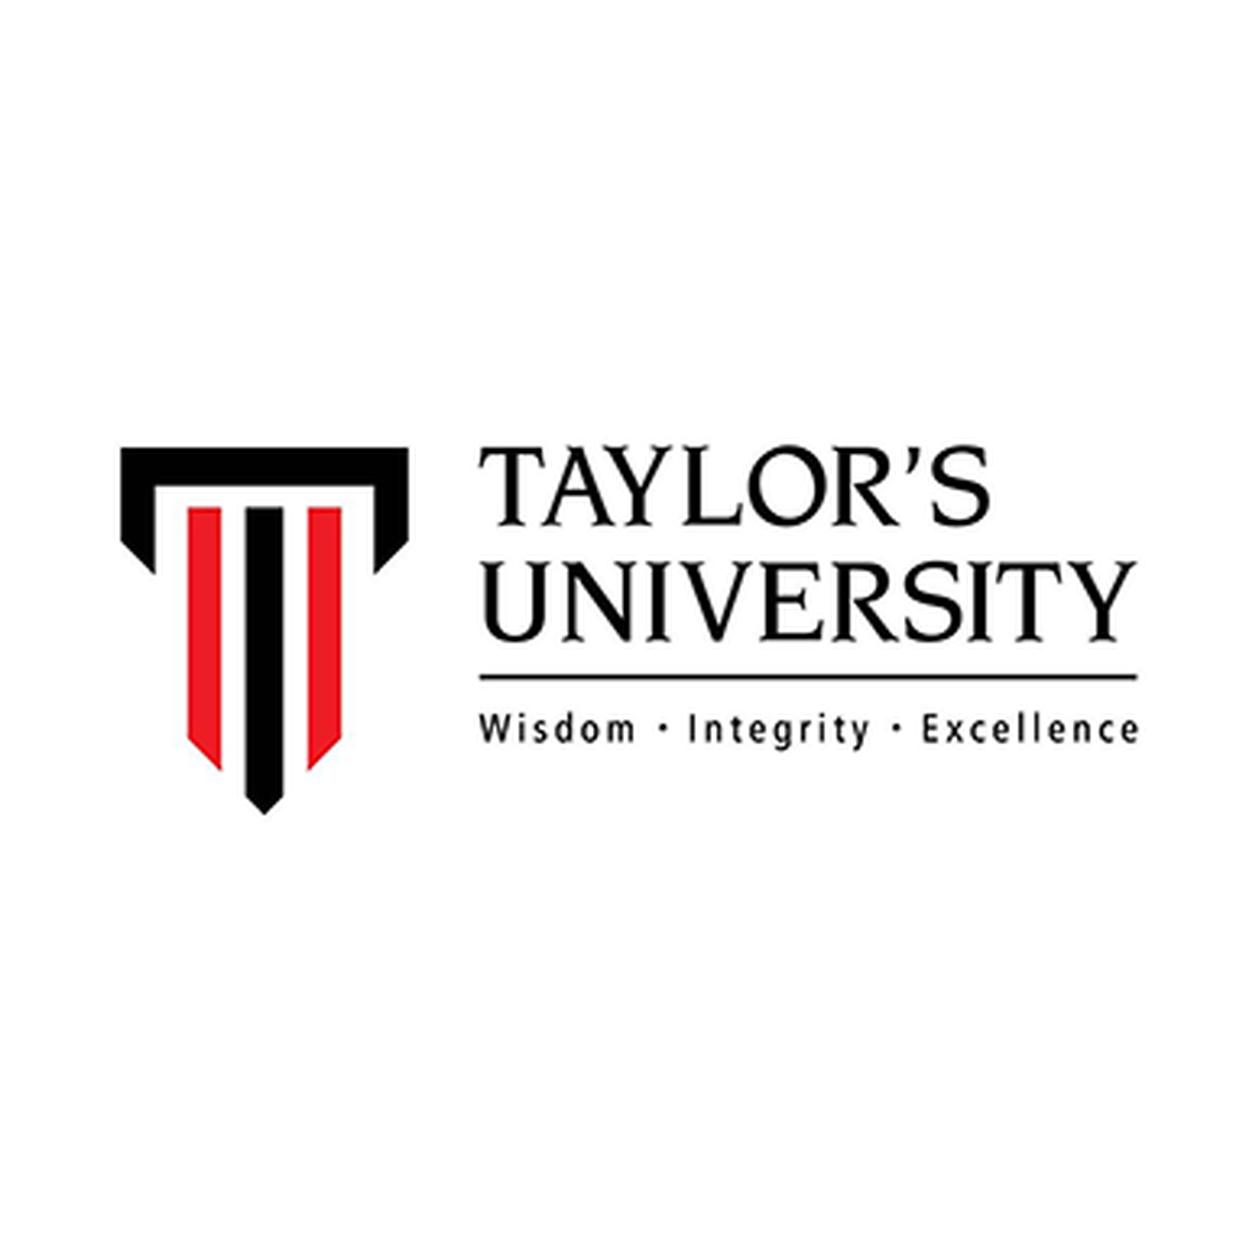 TAYLORS_UNIVERSITY.png